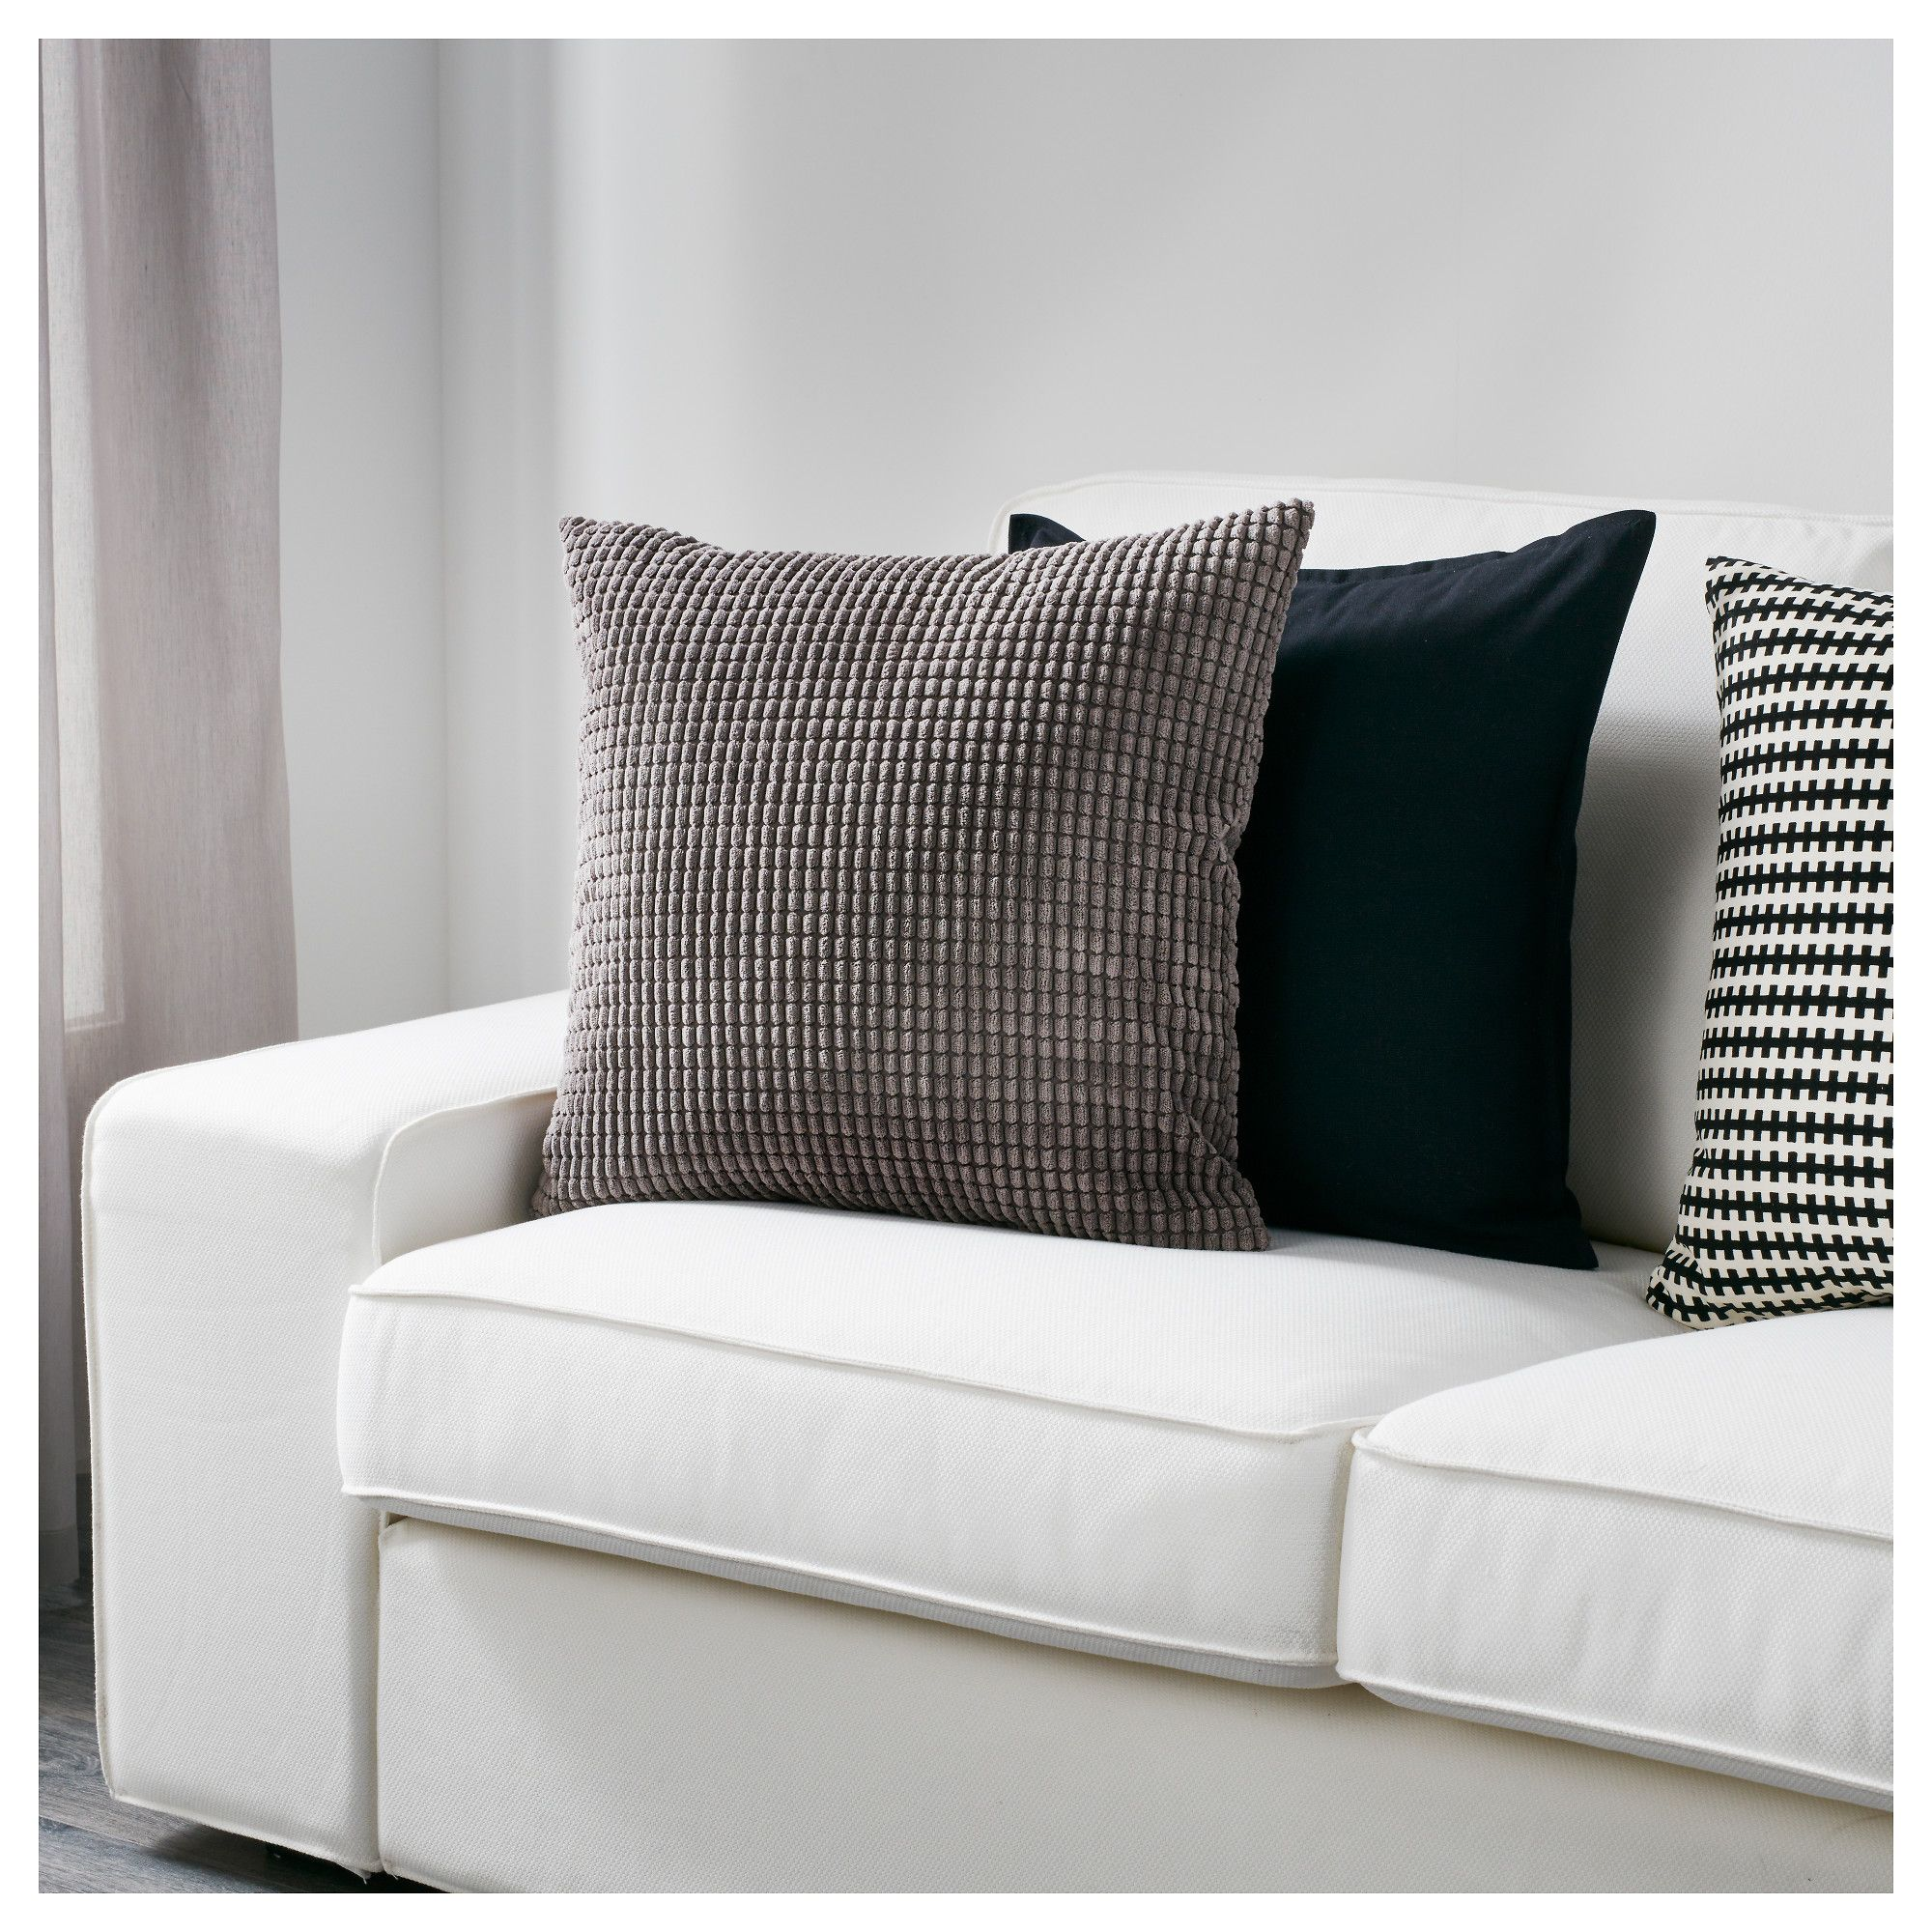 Gullklocka Cushion Cover Gray Ikea Canada Ikea Cushion Cover Ikea Cushions Ikea